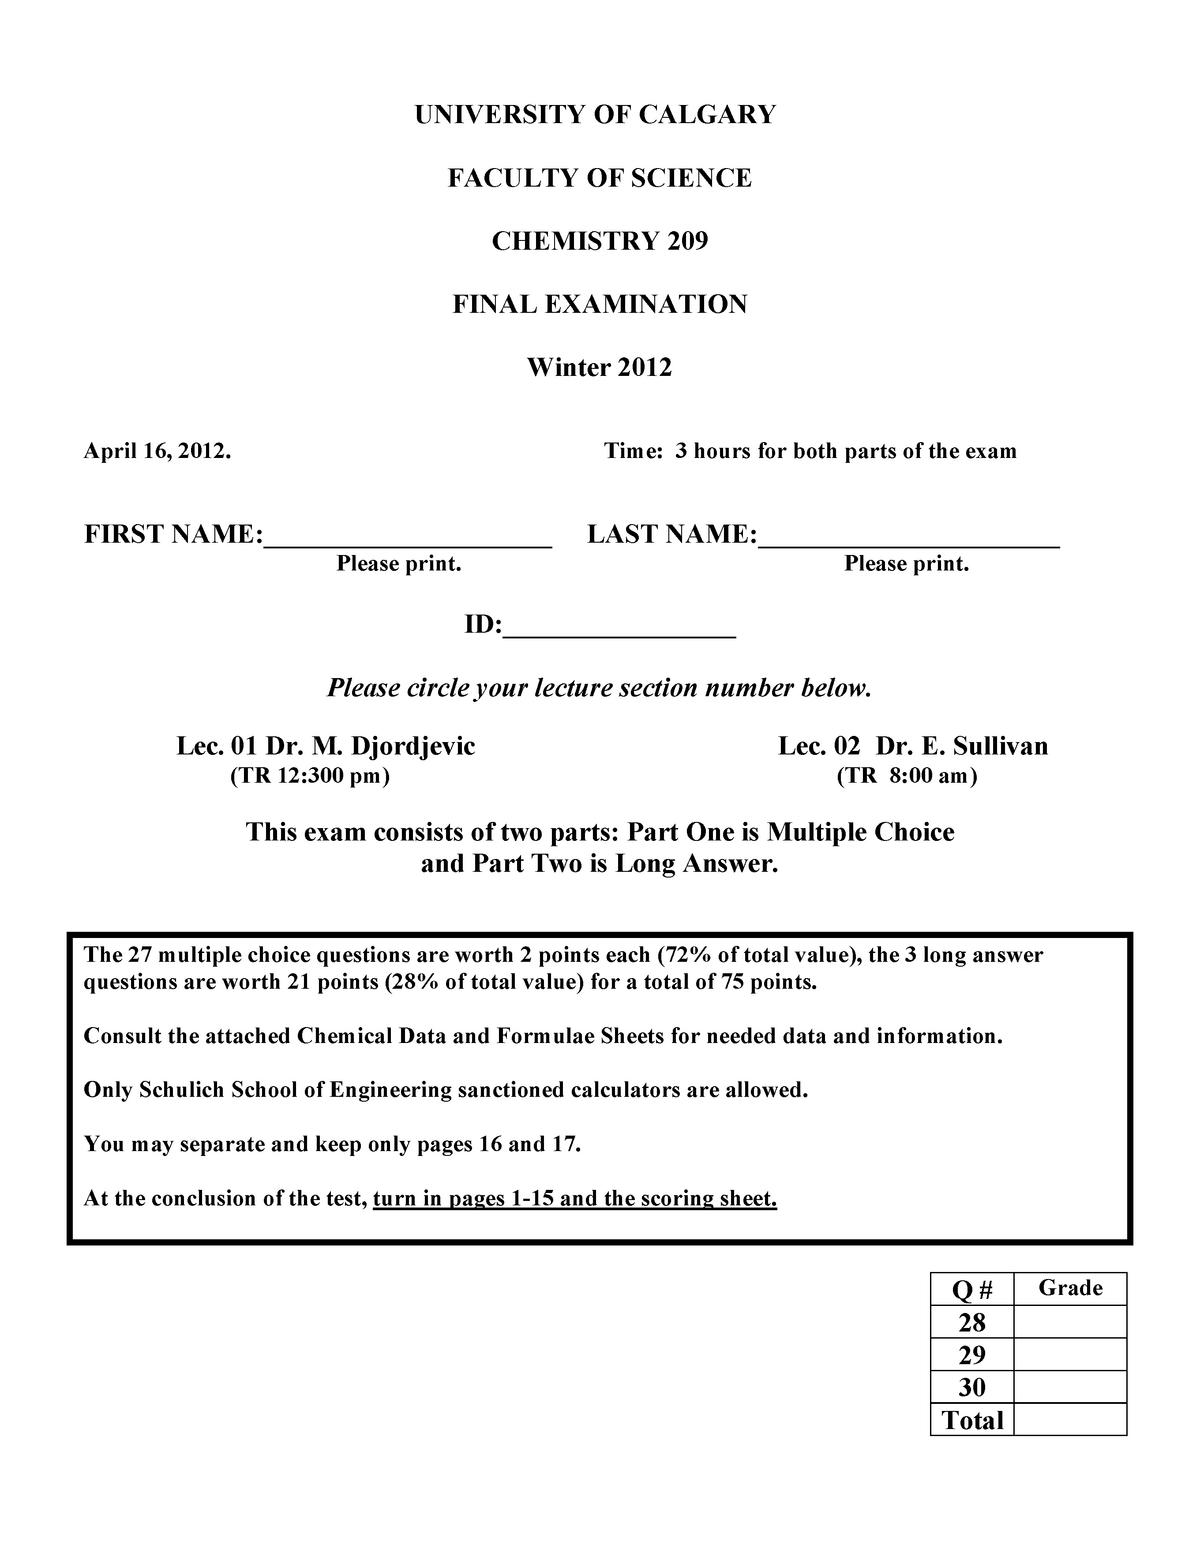 Exam 2012 - Chemistry 209: General Chemistry for Engineers - StuDocu